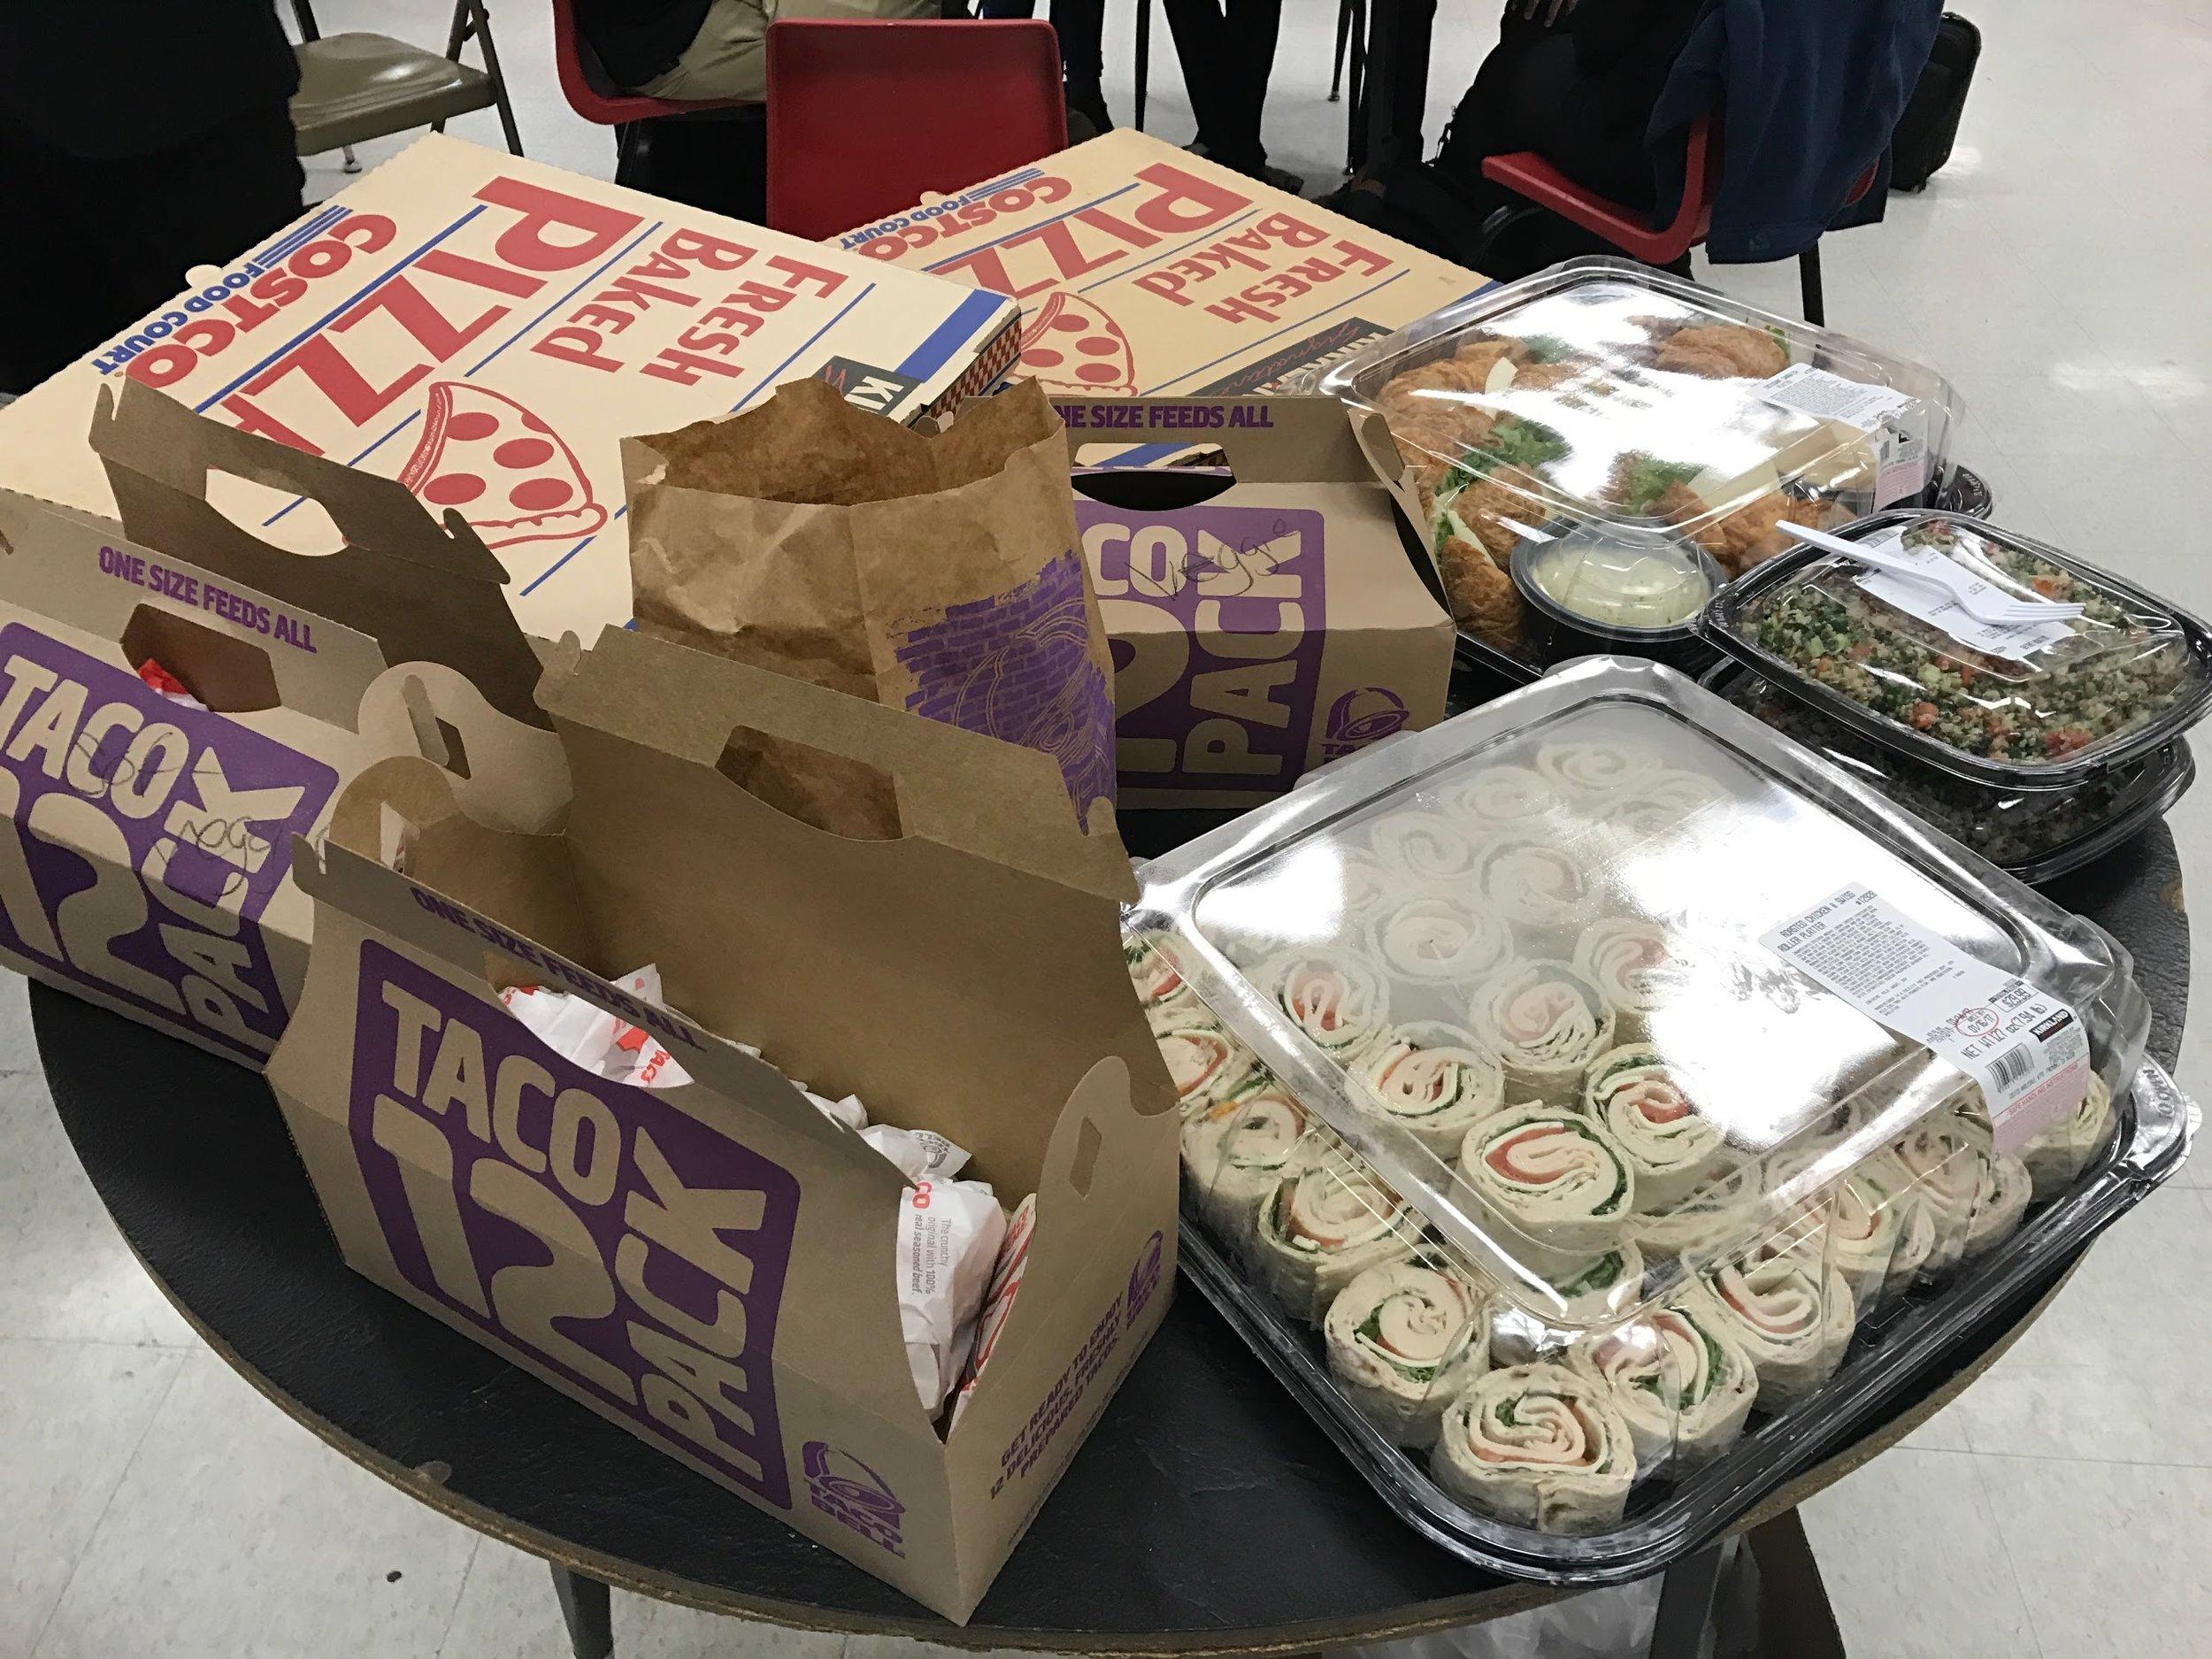 Taco bell, pizzas, salad, wraps, sandwiches! YUM!